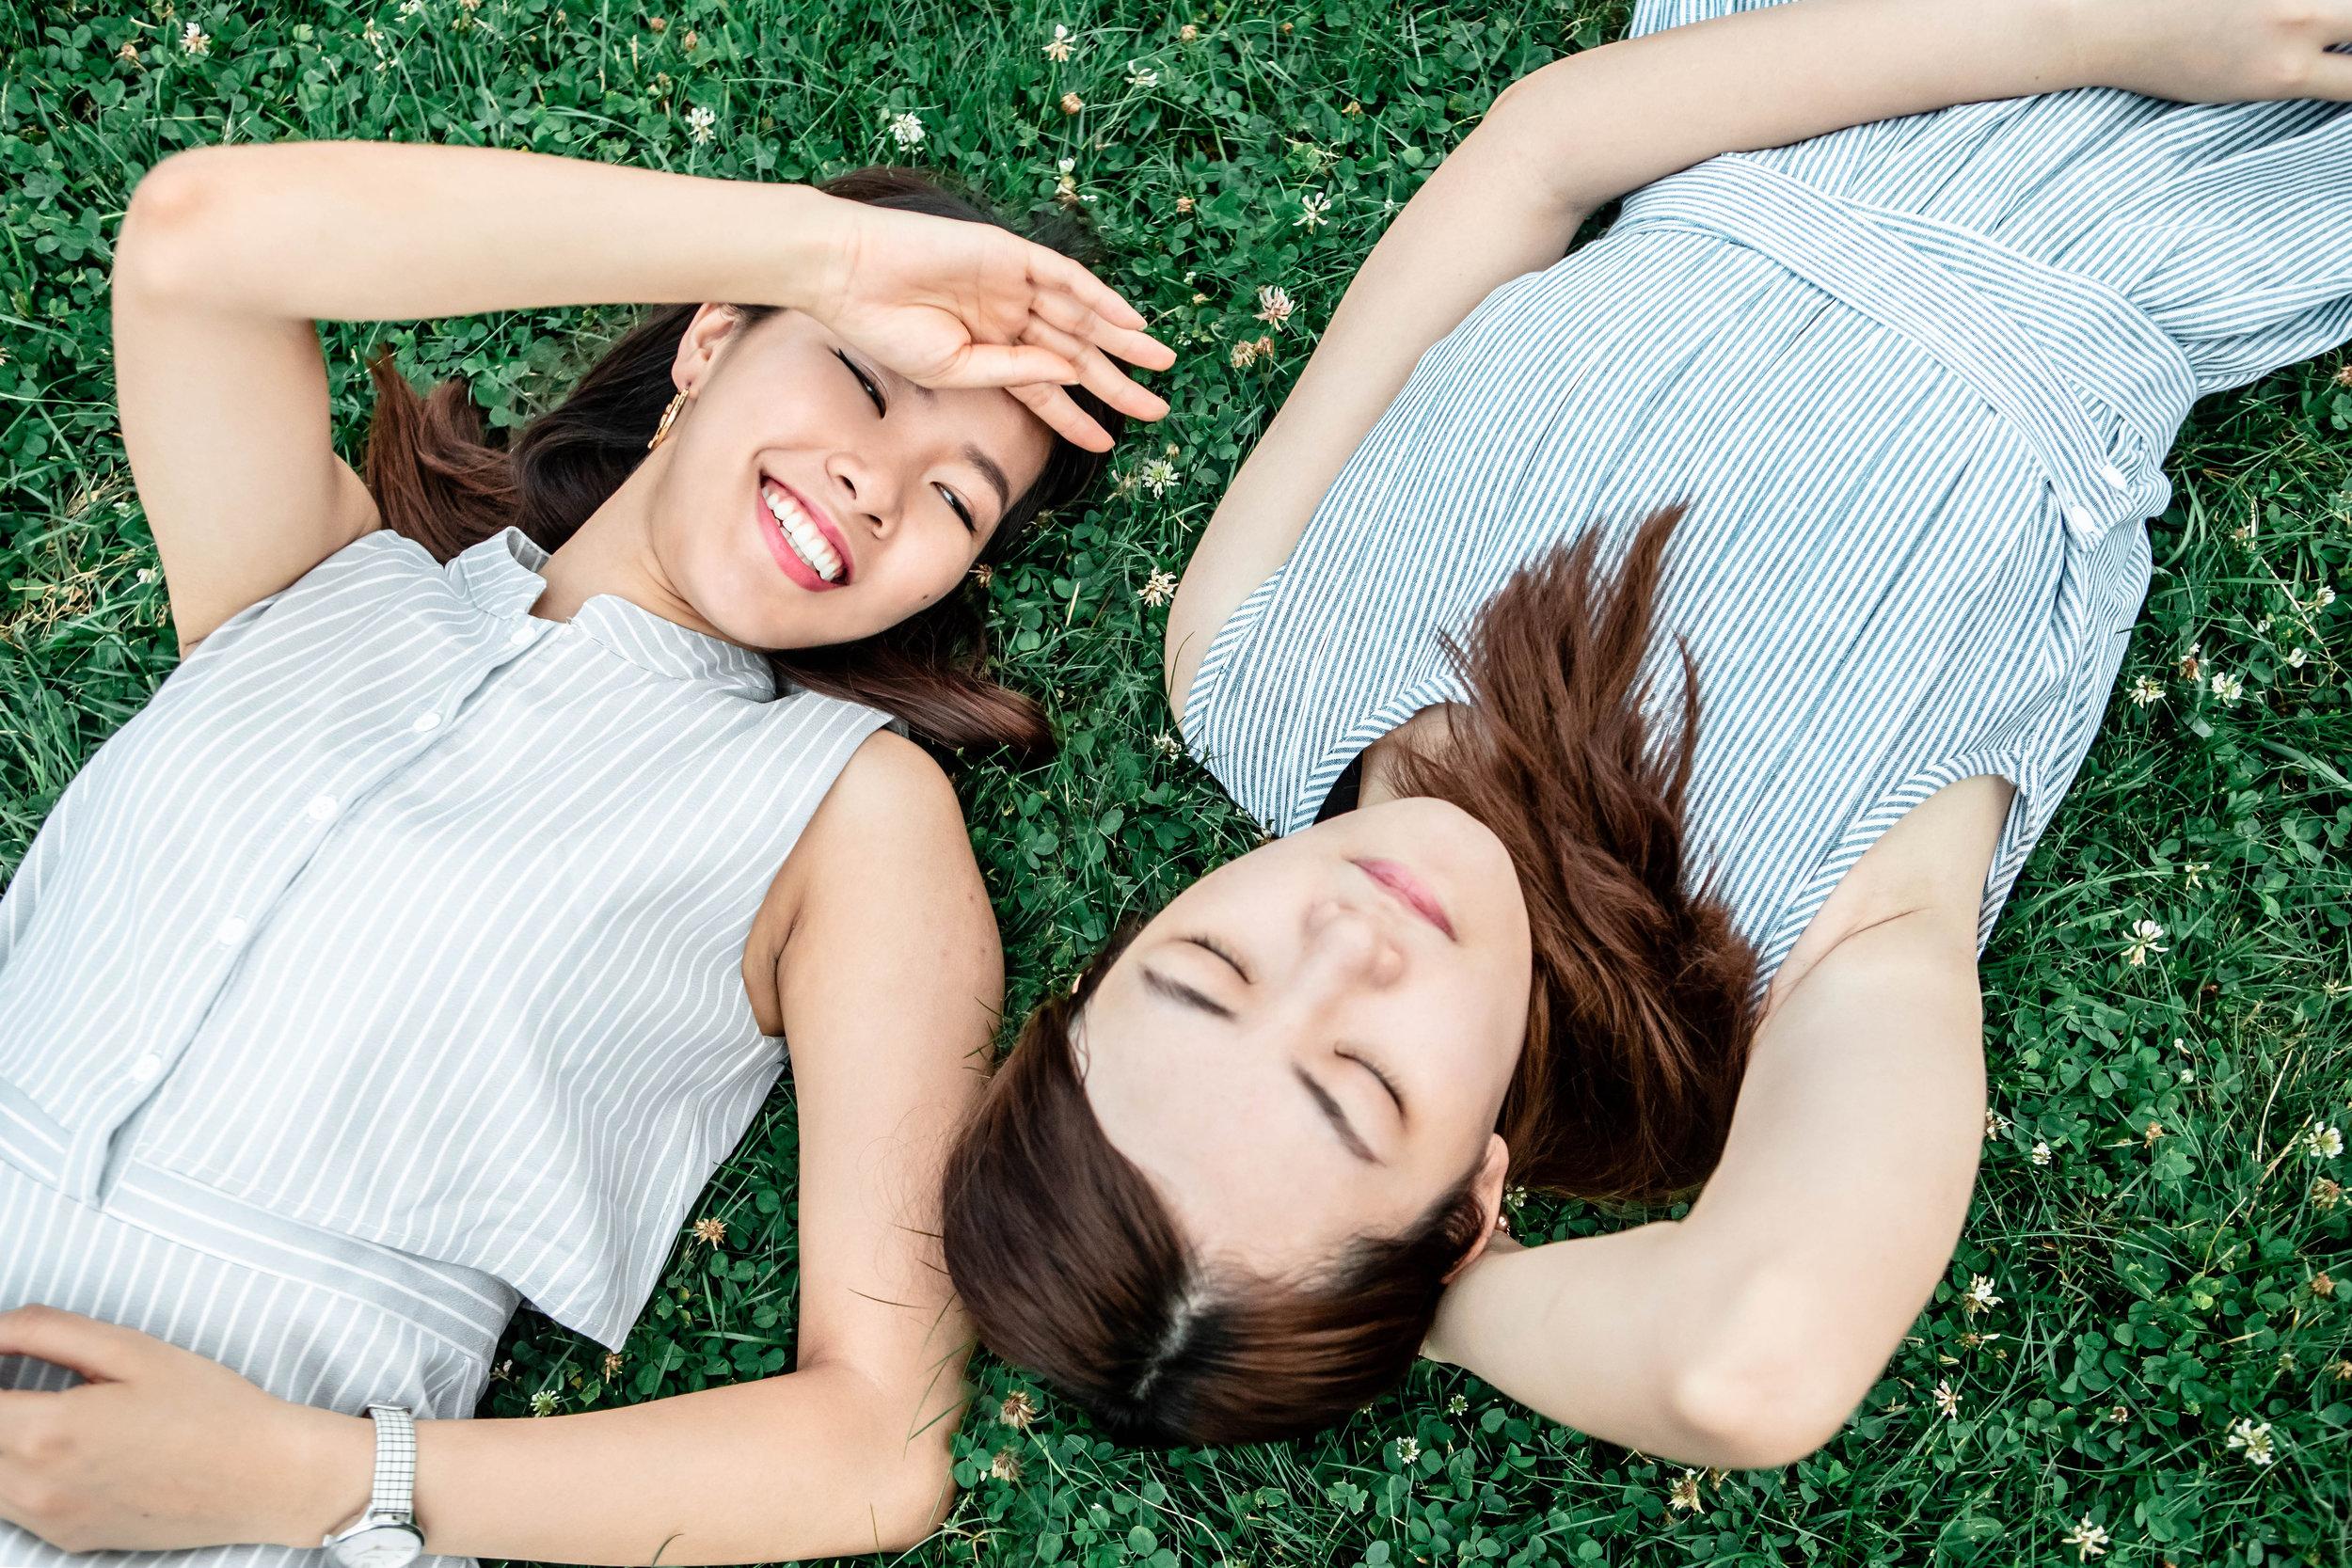 sisters-in-summertime-eva-loh-17.jpg